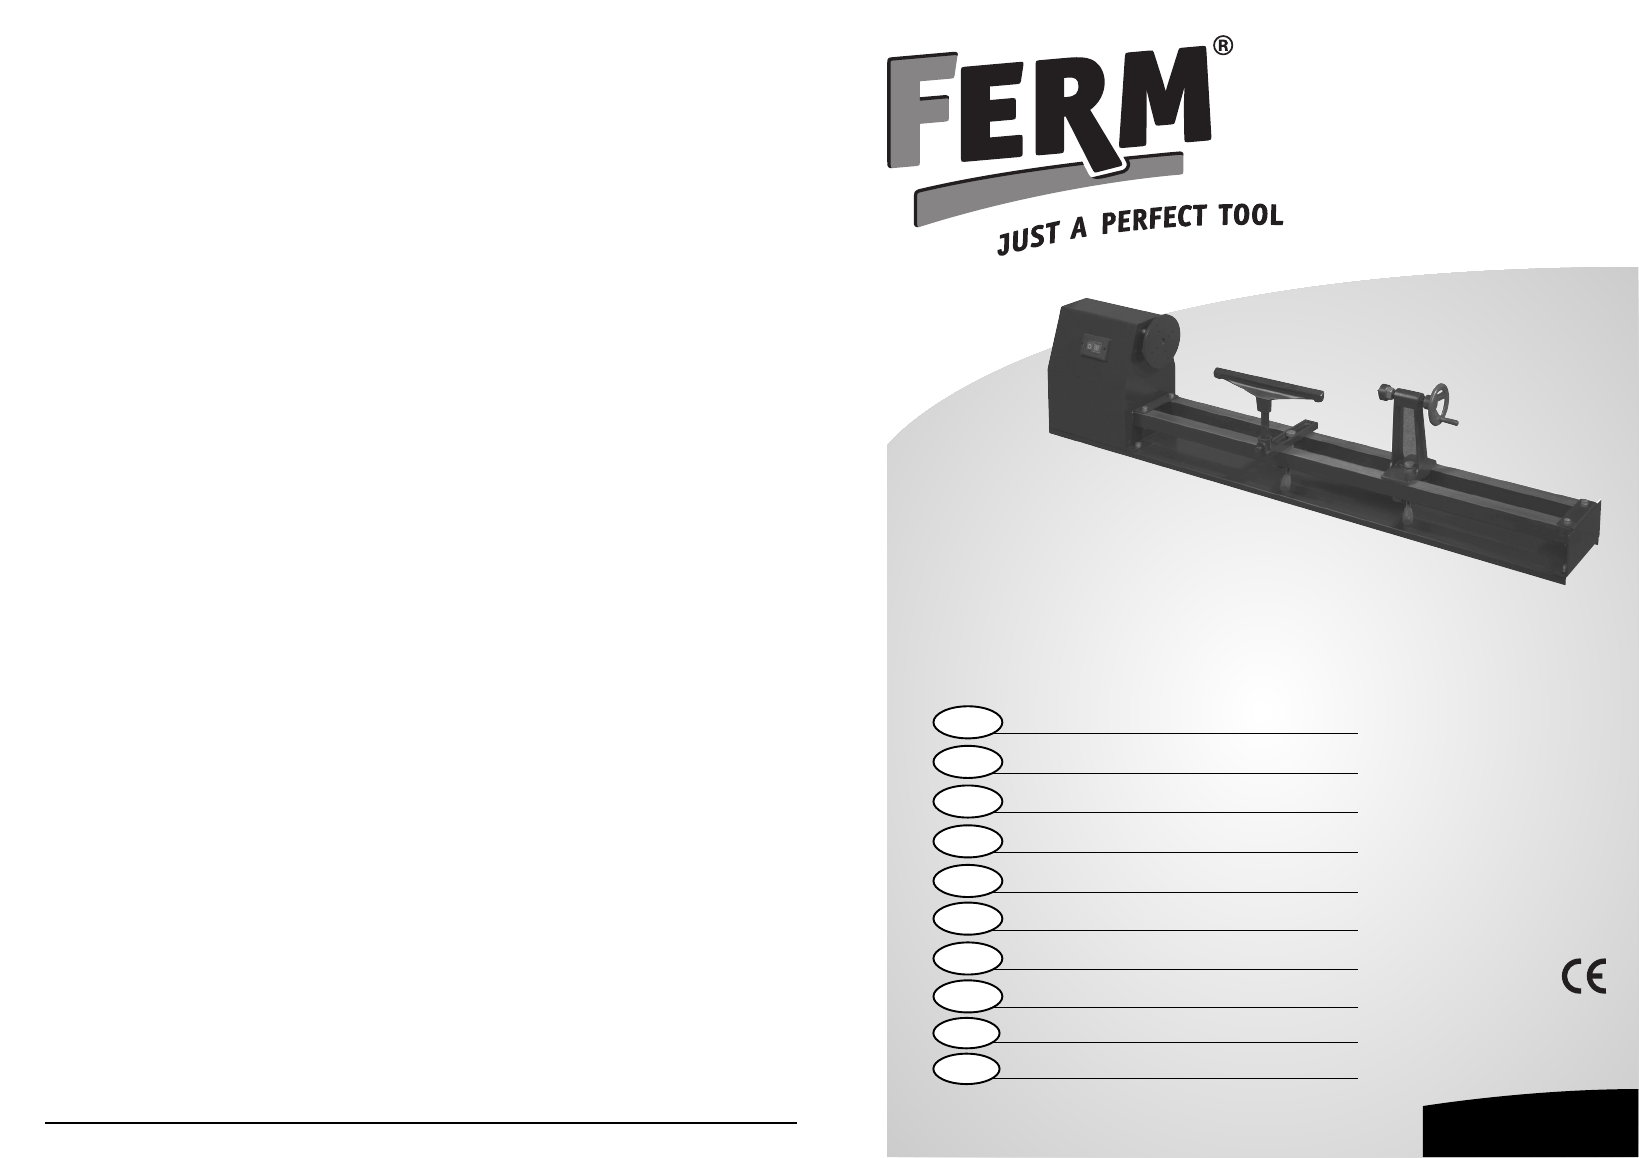 инструкция на станок ferm